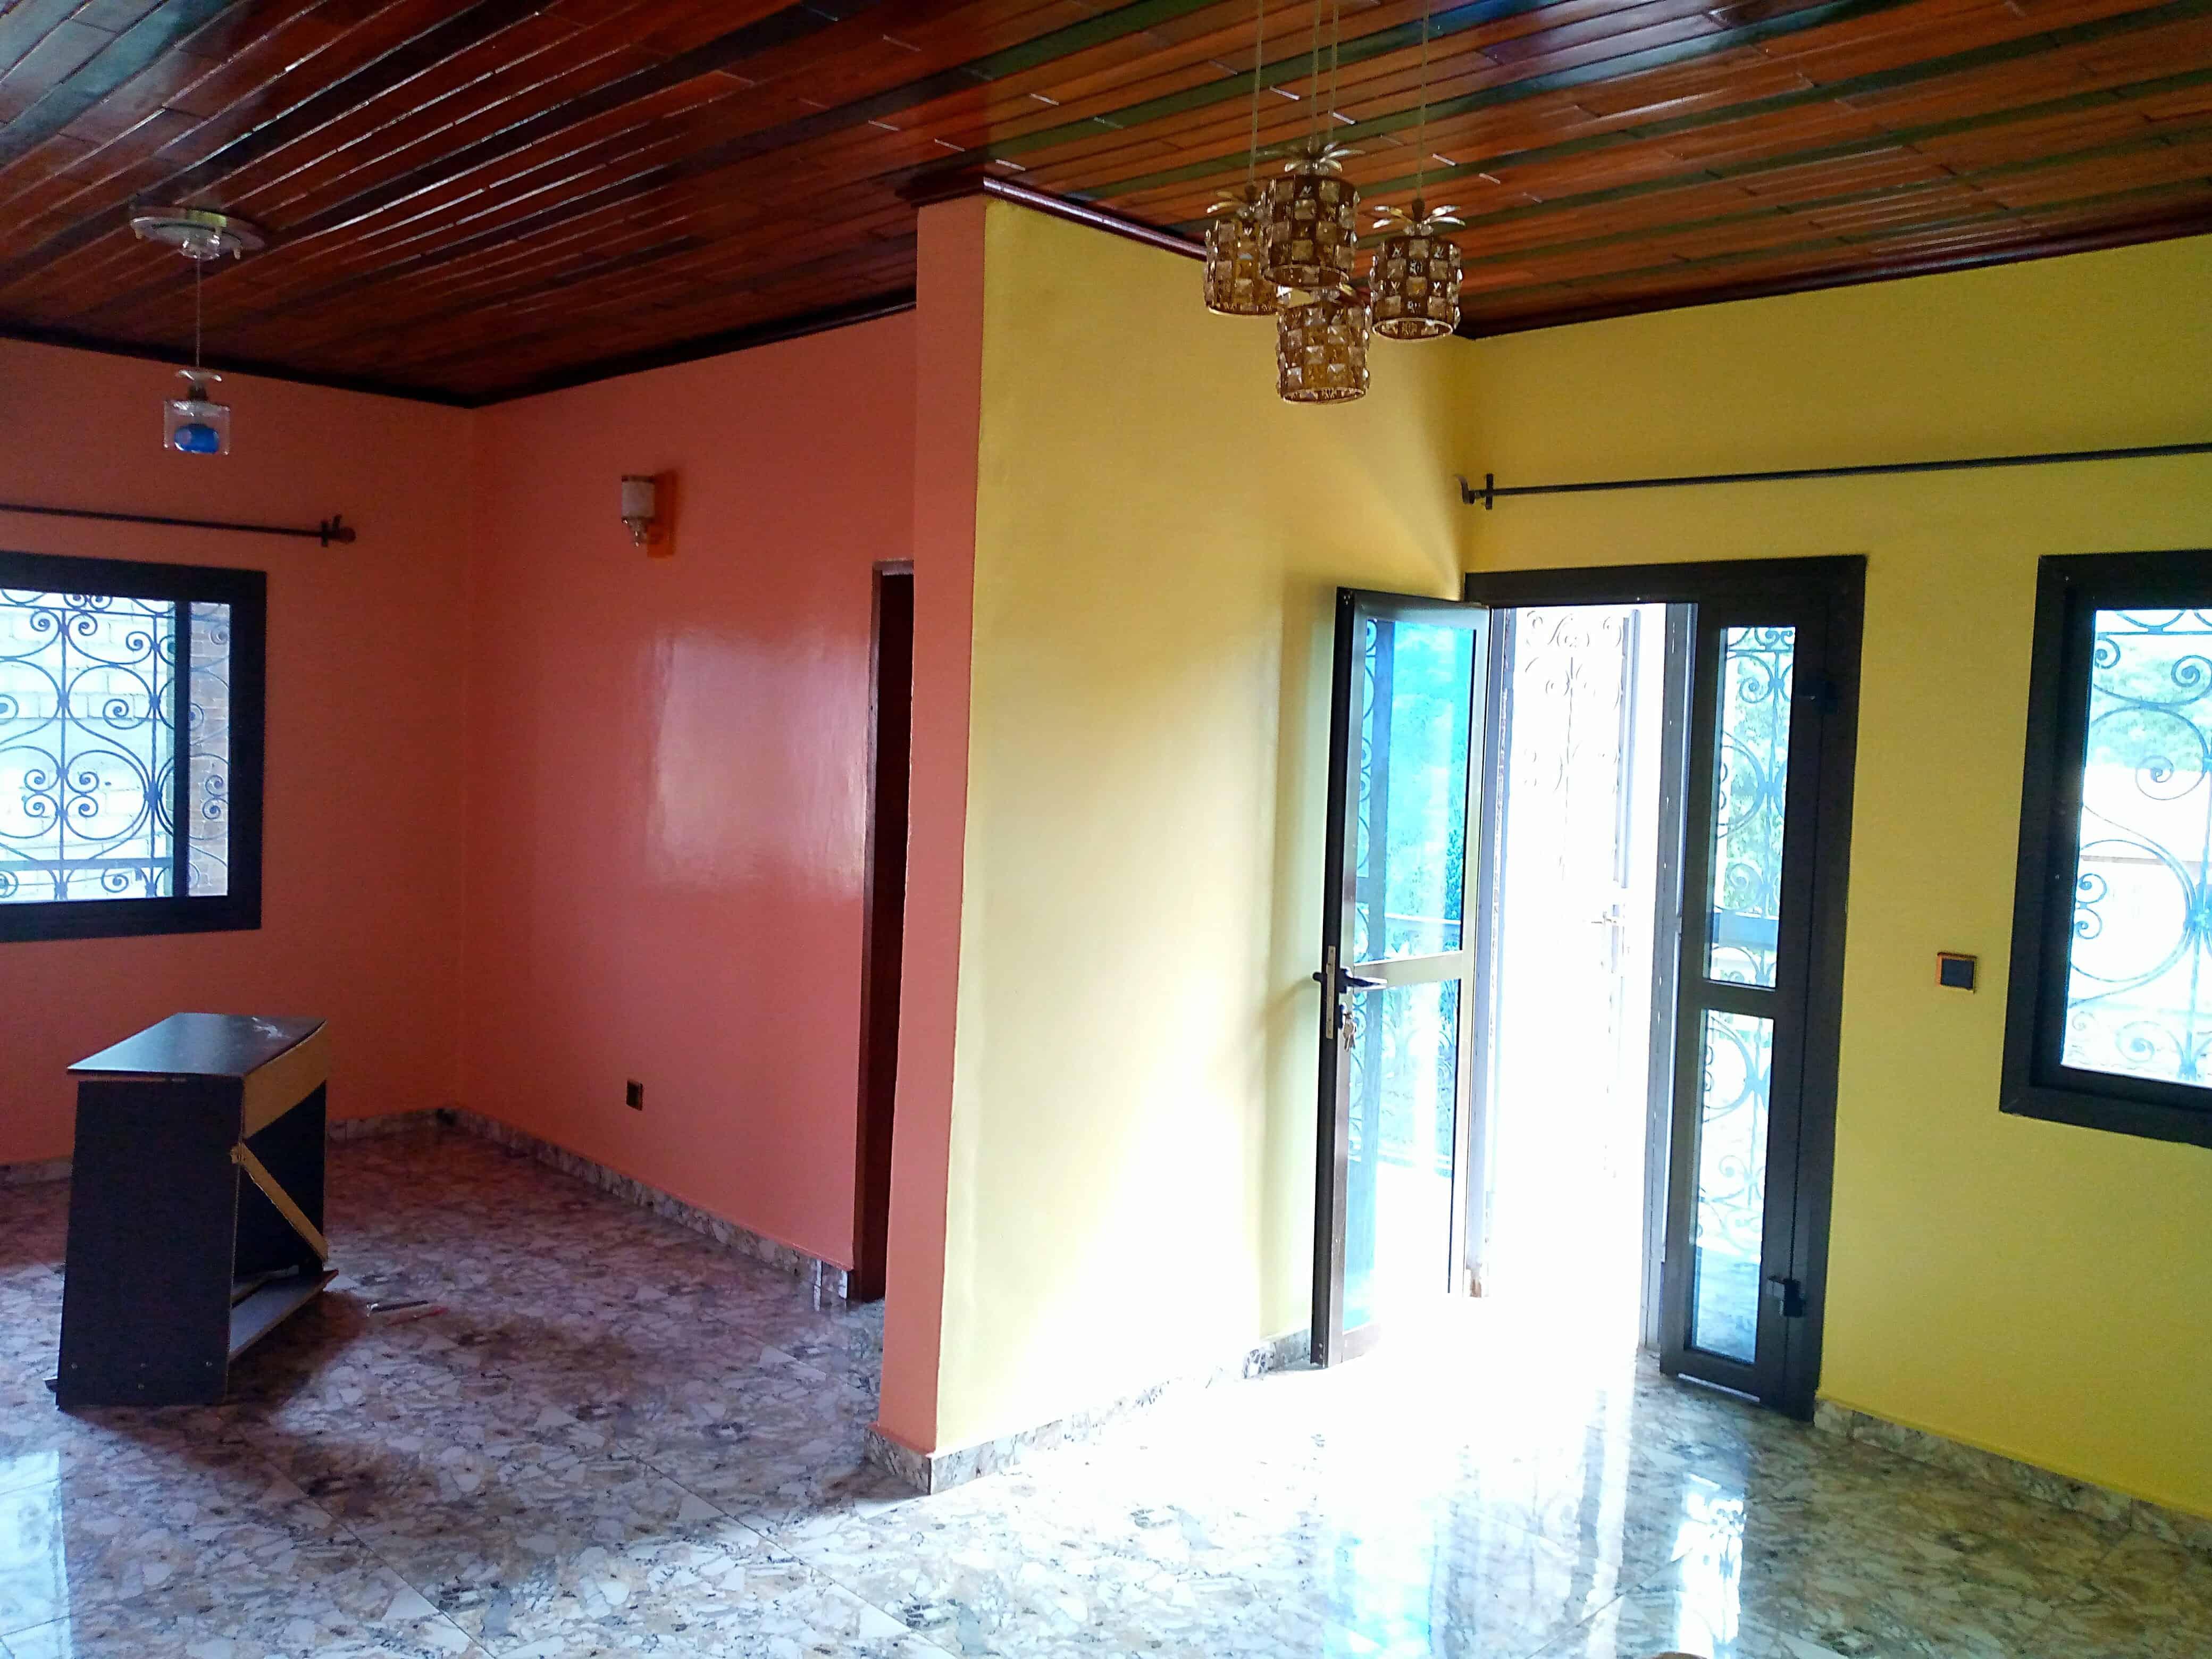 Apartment to rent - Yaoundé, Nkolbisson, Dagobert - 2 living room(s), 2 bedroom(s), 2 bathroom(s) - 110 000 FCFA / month